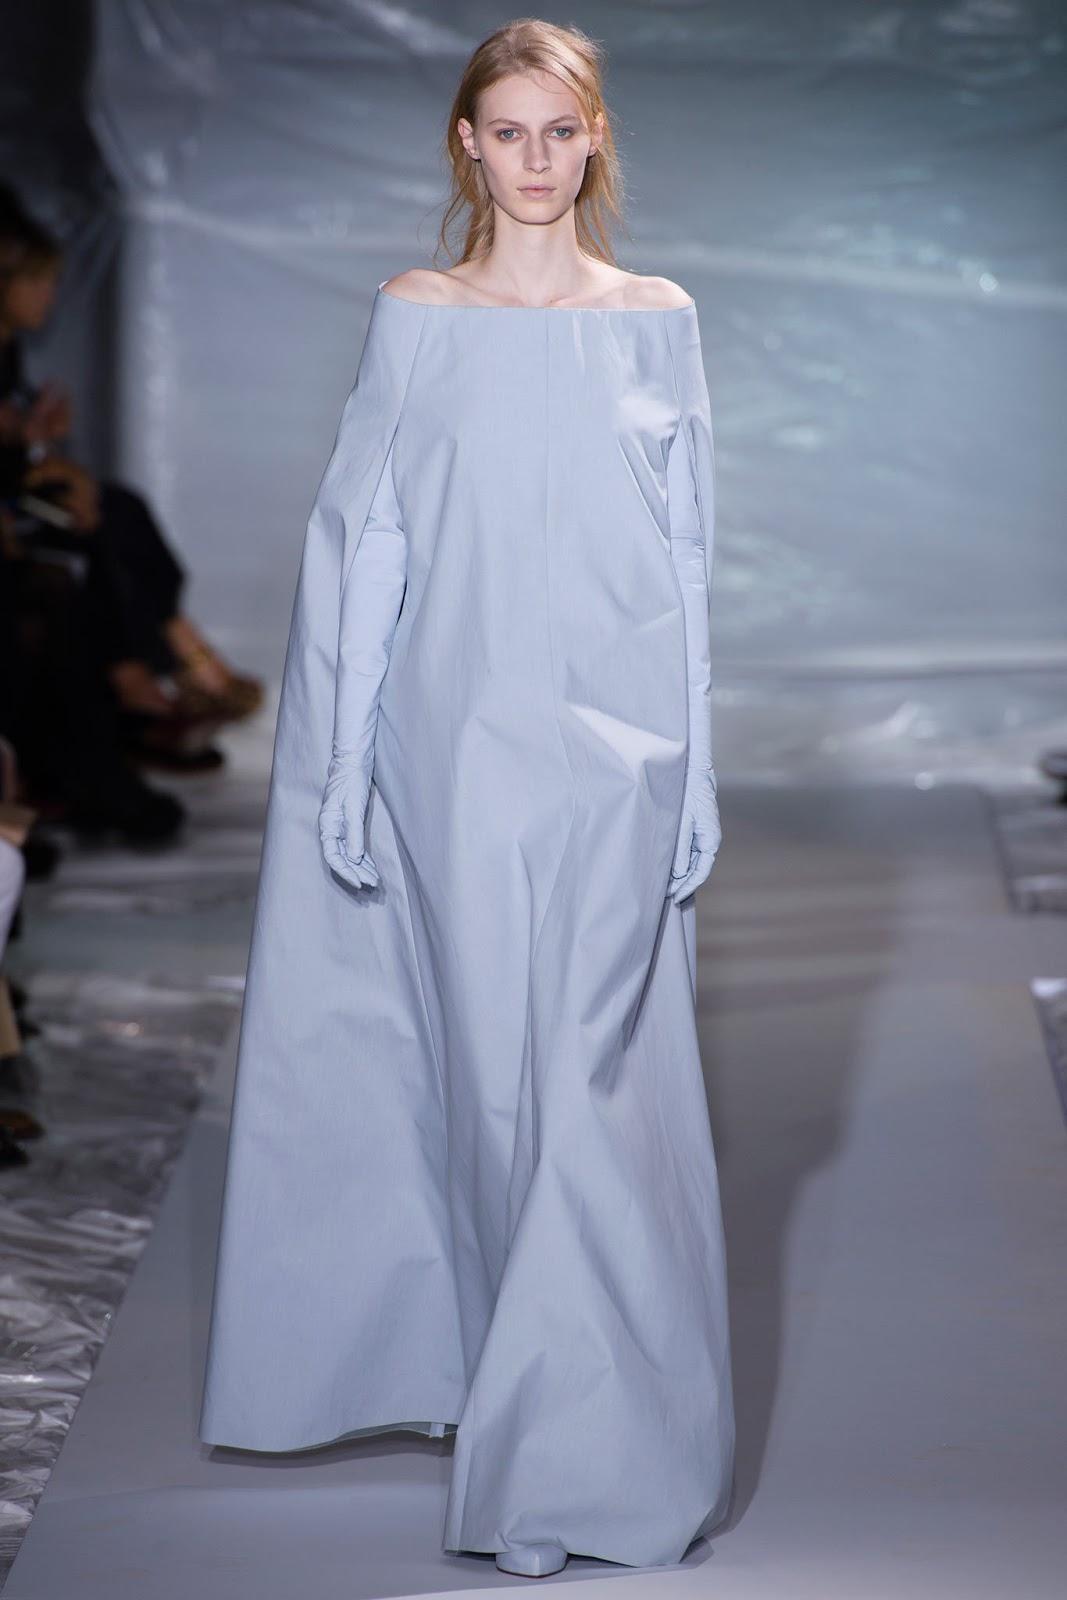 Shopping outfit of the day vivian loh fashion lifestyle for Maison margiela paris